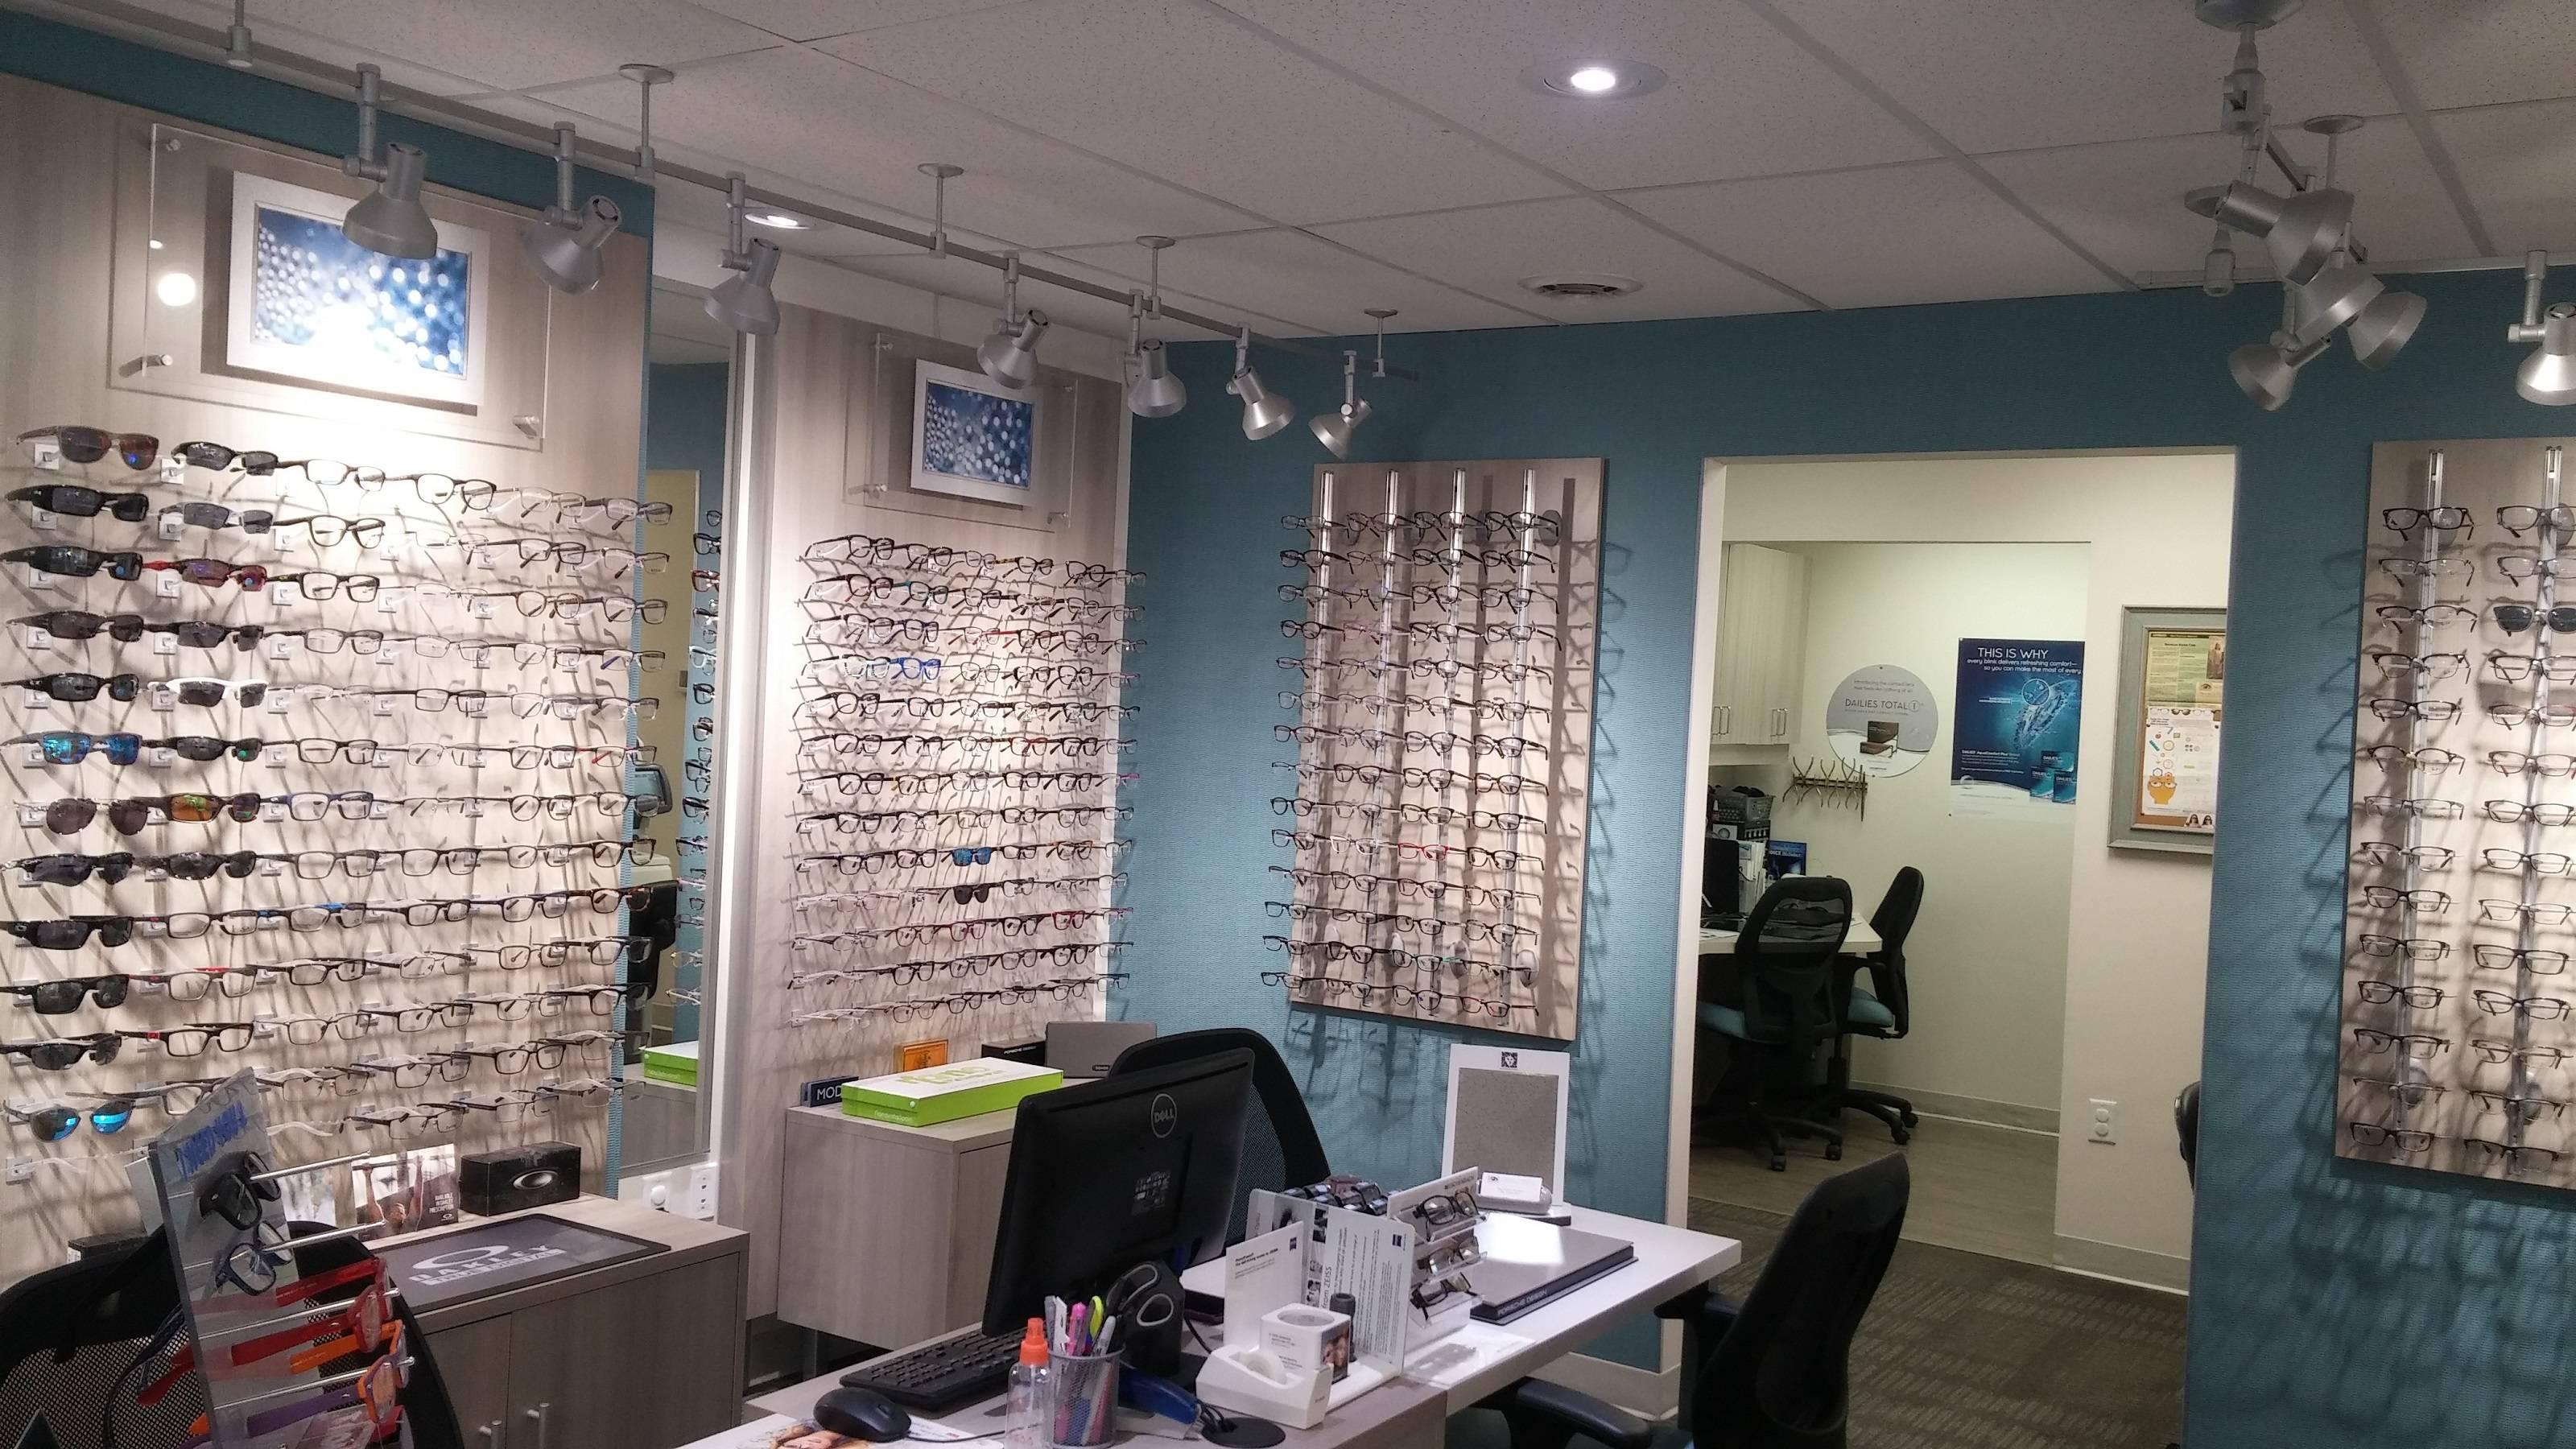 brooklin_vision_care_optical_wall_and_exam_room